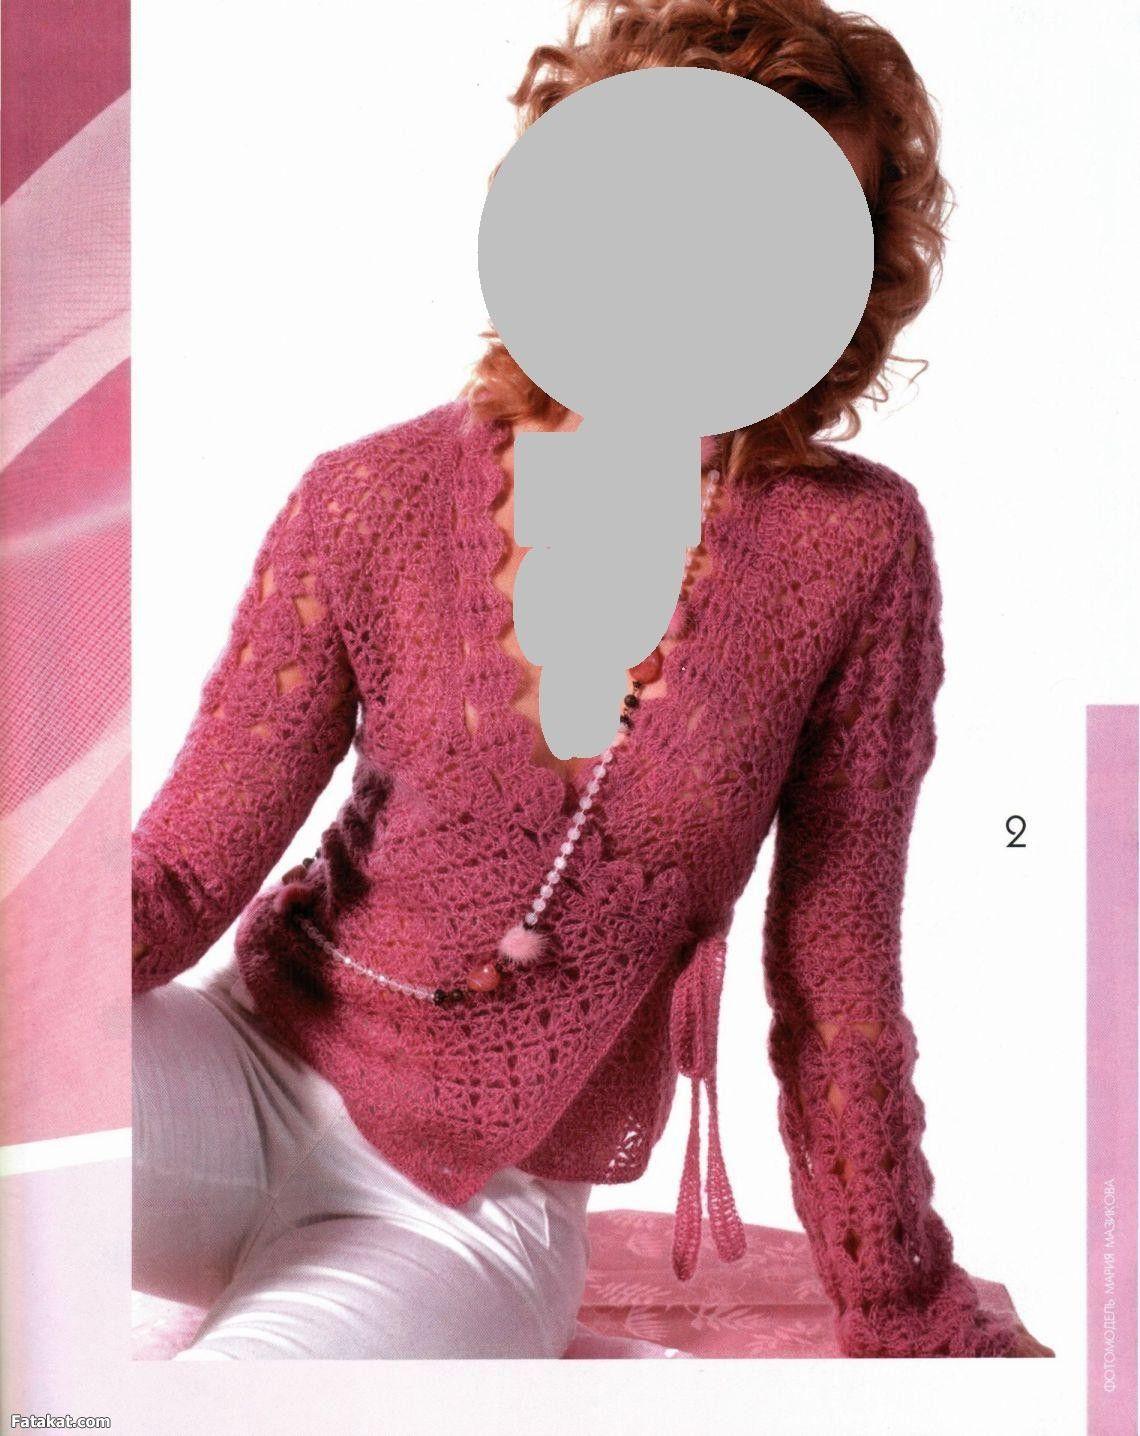 شرح بلوزة كروشيه كروازيه رقيقة Sweater Crochet Pattern Lace Sweater Pattern Crochet Clothes